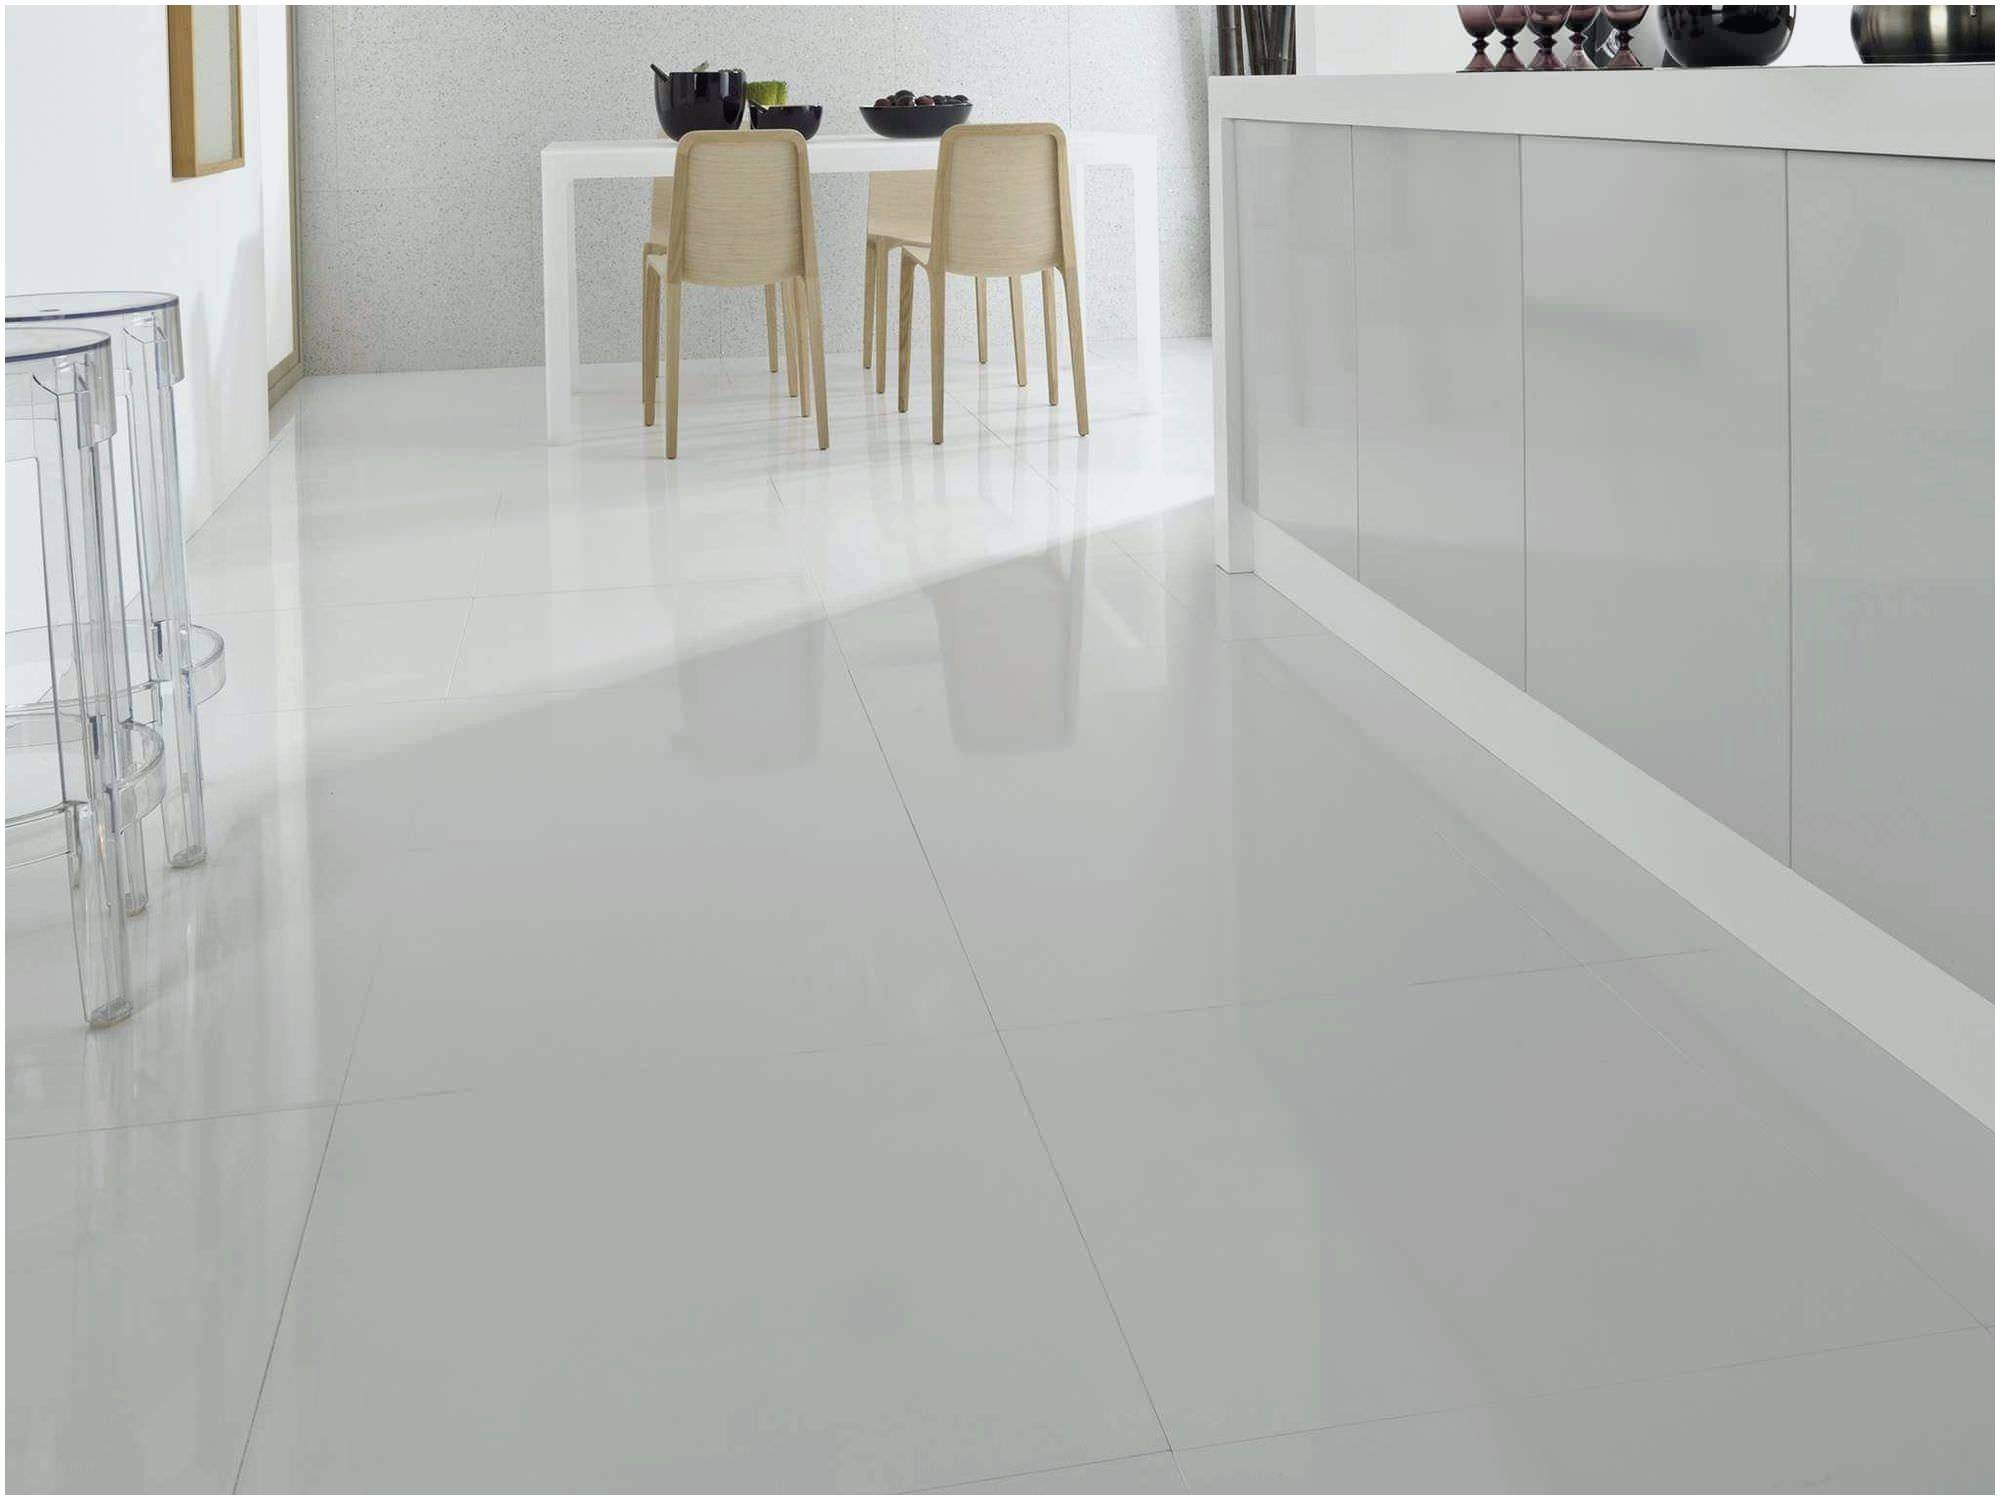 grey hardwood flooring ideas of fresh 40 how to deep clean vinyl floors inspiration for excellent for fresh 40 how to deep clean vinyl floors inspiration for excellent church flooring ideas